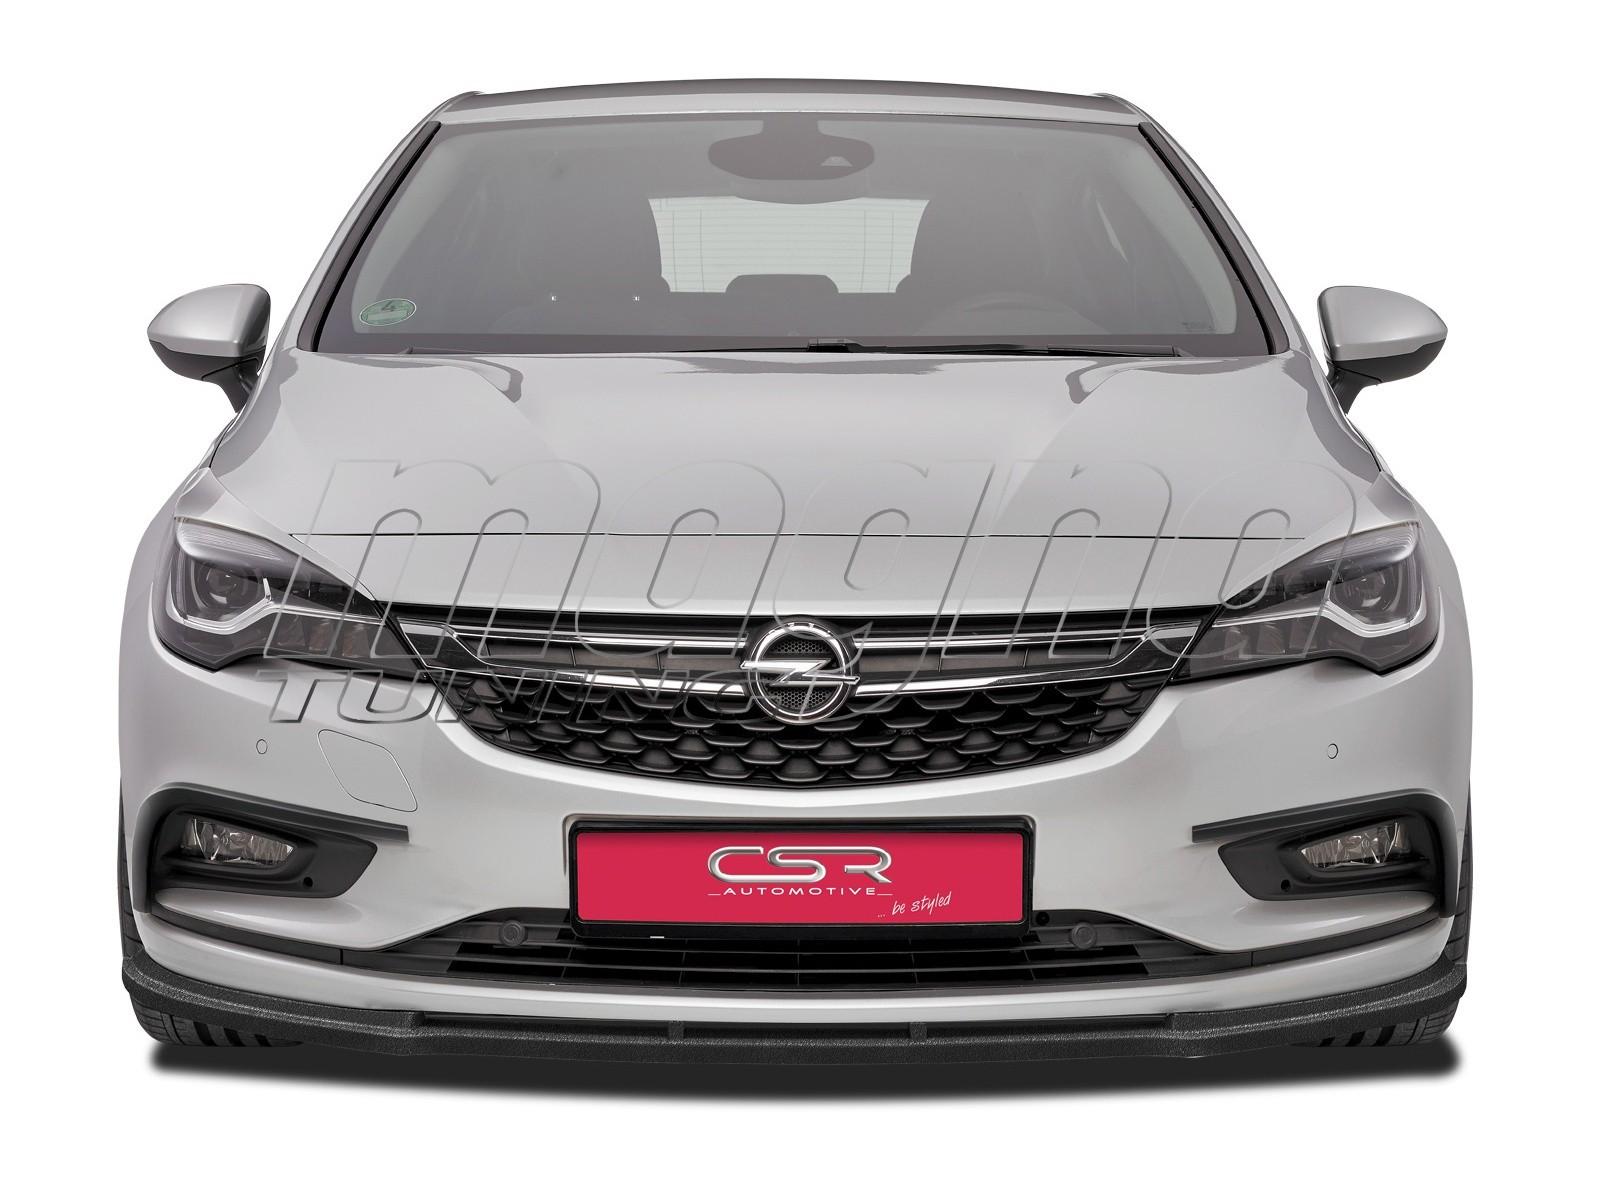 Opel Astra K CX Front Bumper Extension